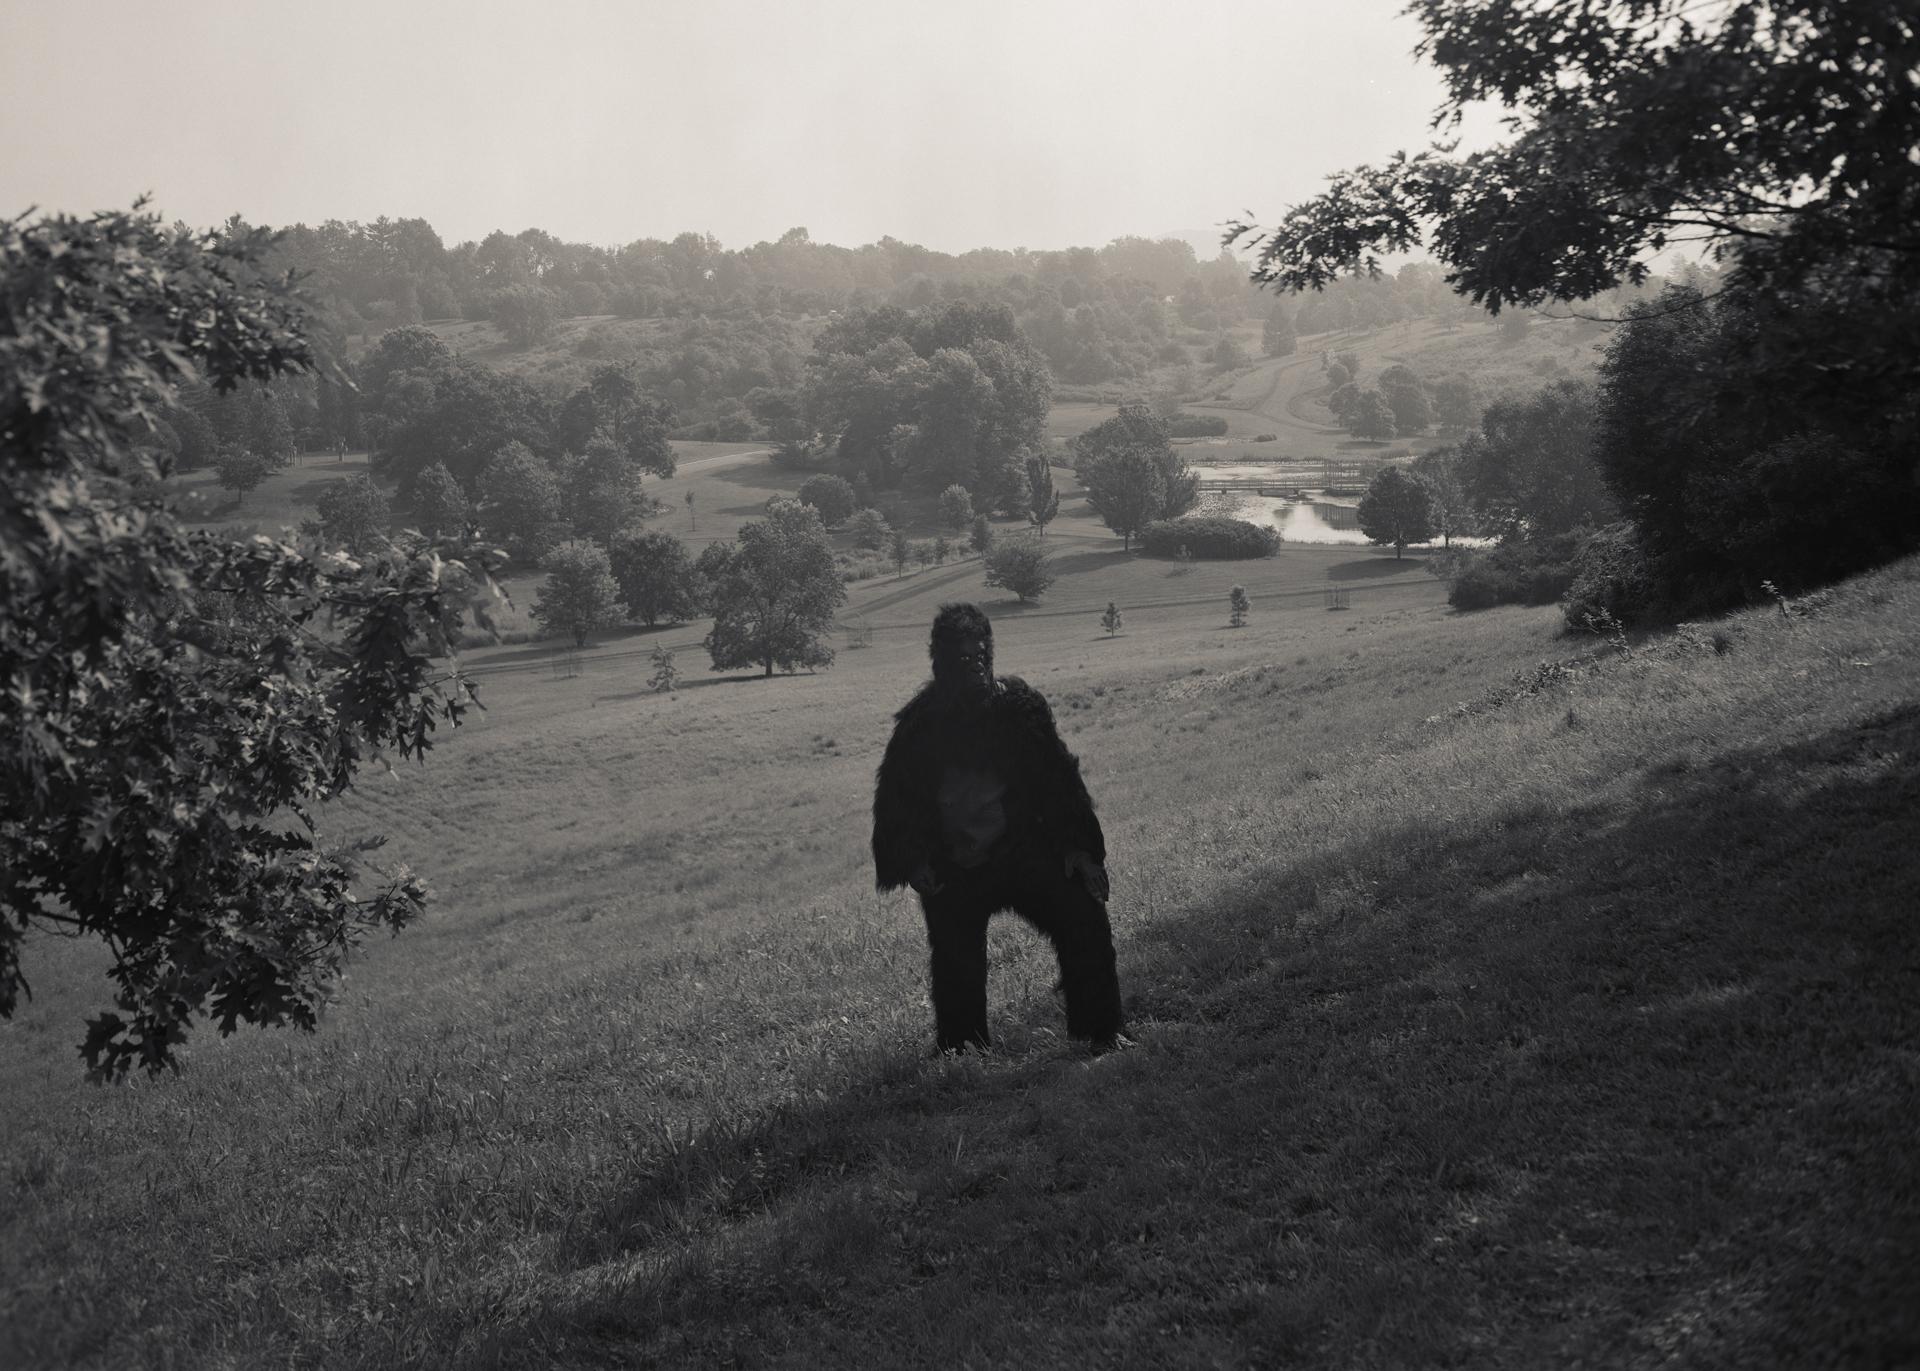 Gorilla-In-The-Field001.jpg